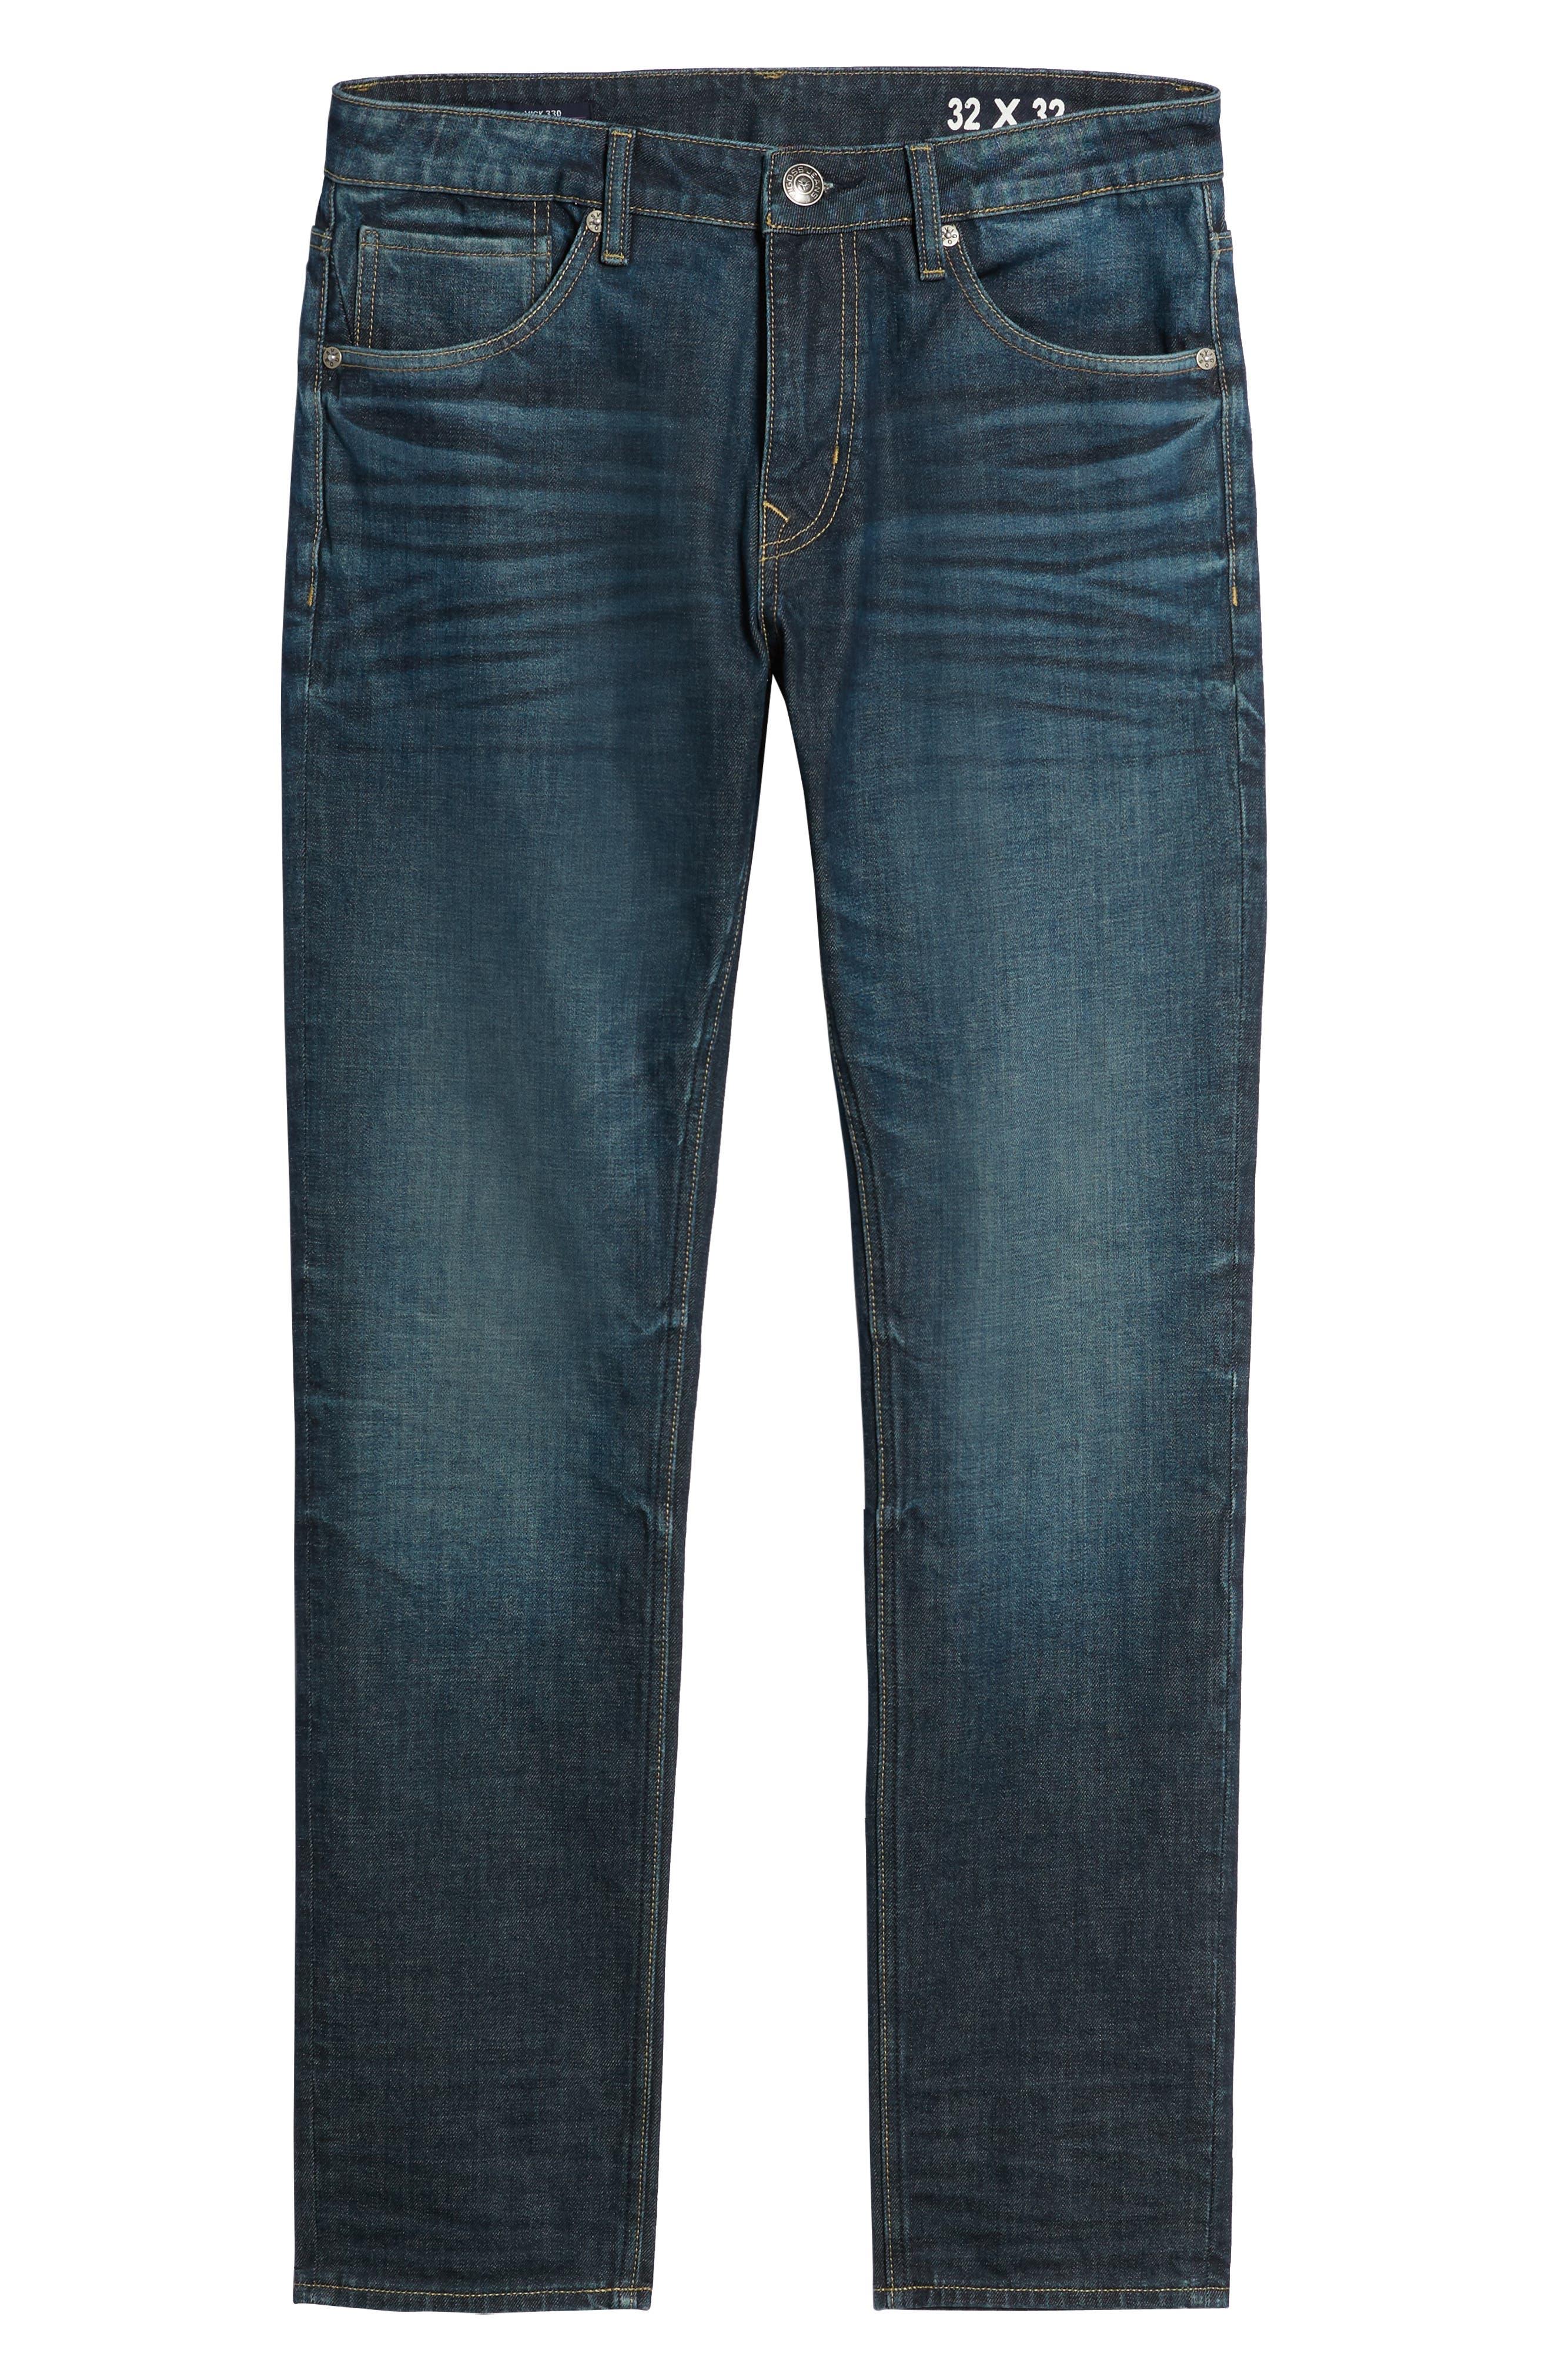 Mick Slim Fit Jeans,                             Alternate thumbnail 6, color,                             DARK 3D WASH